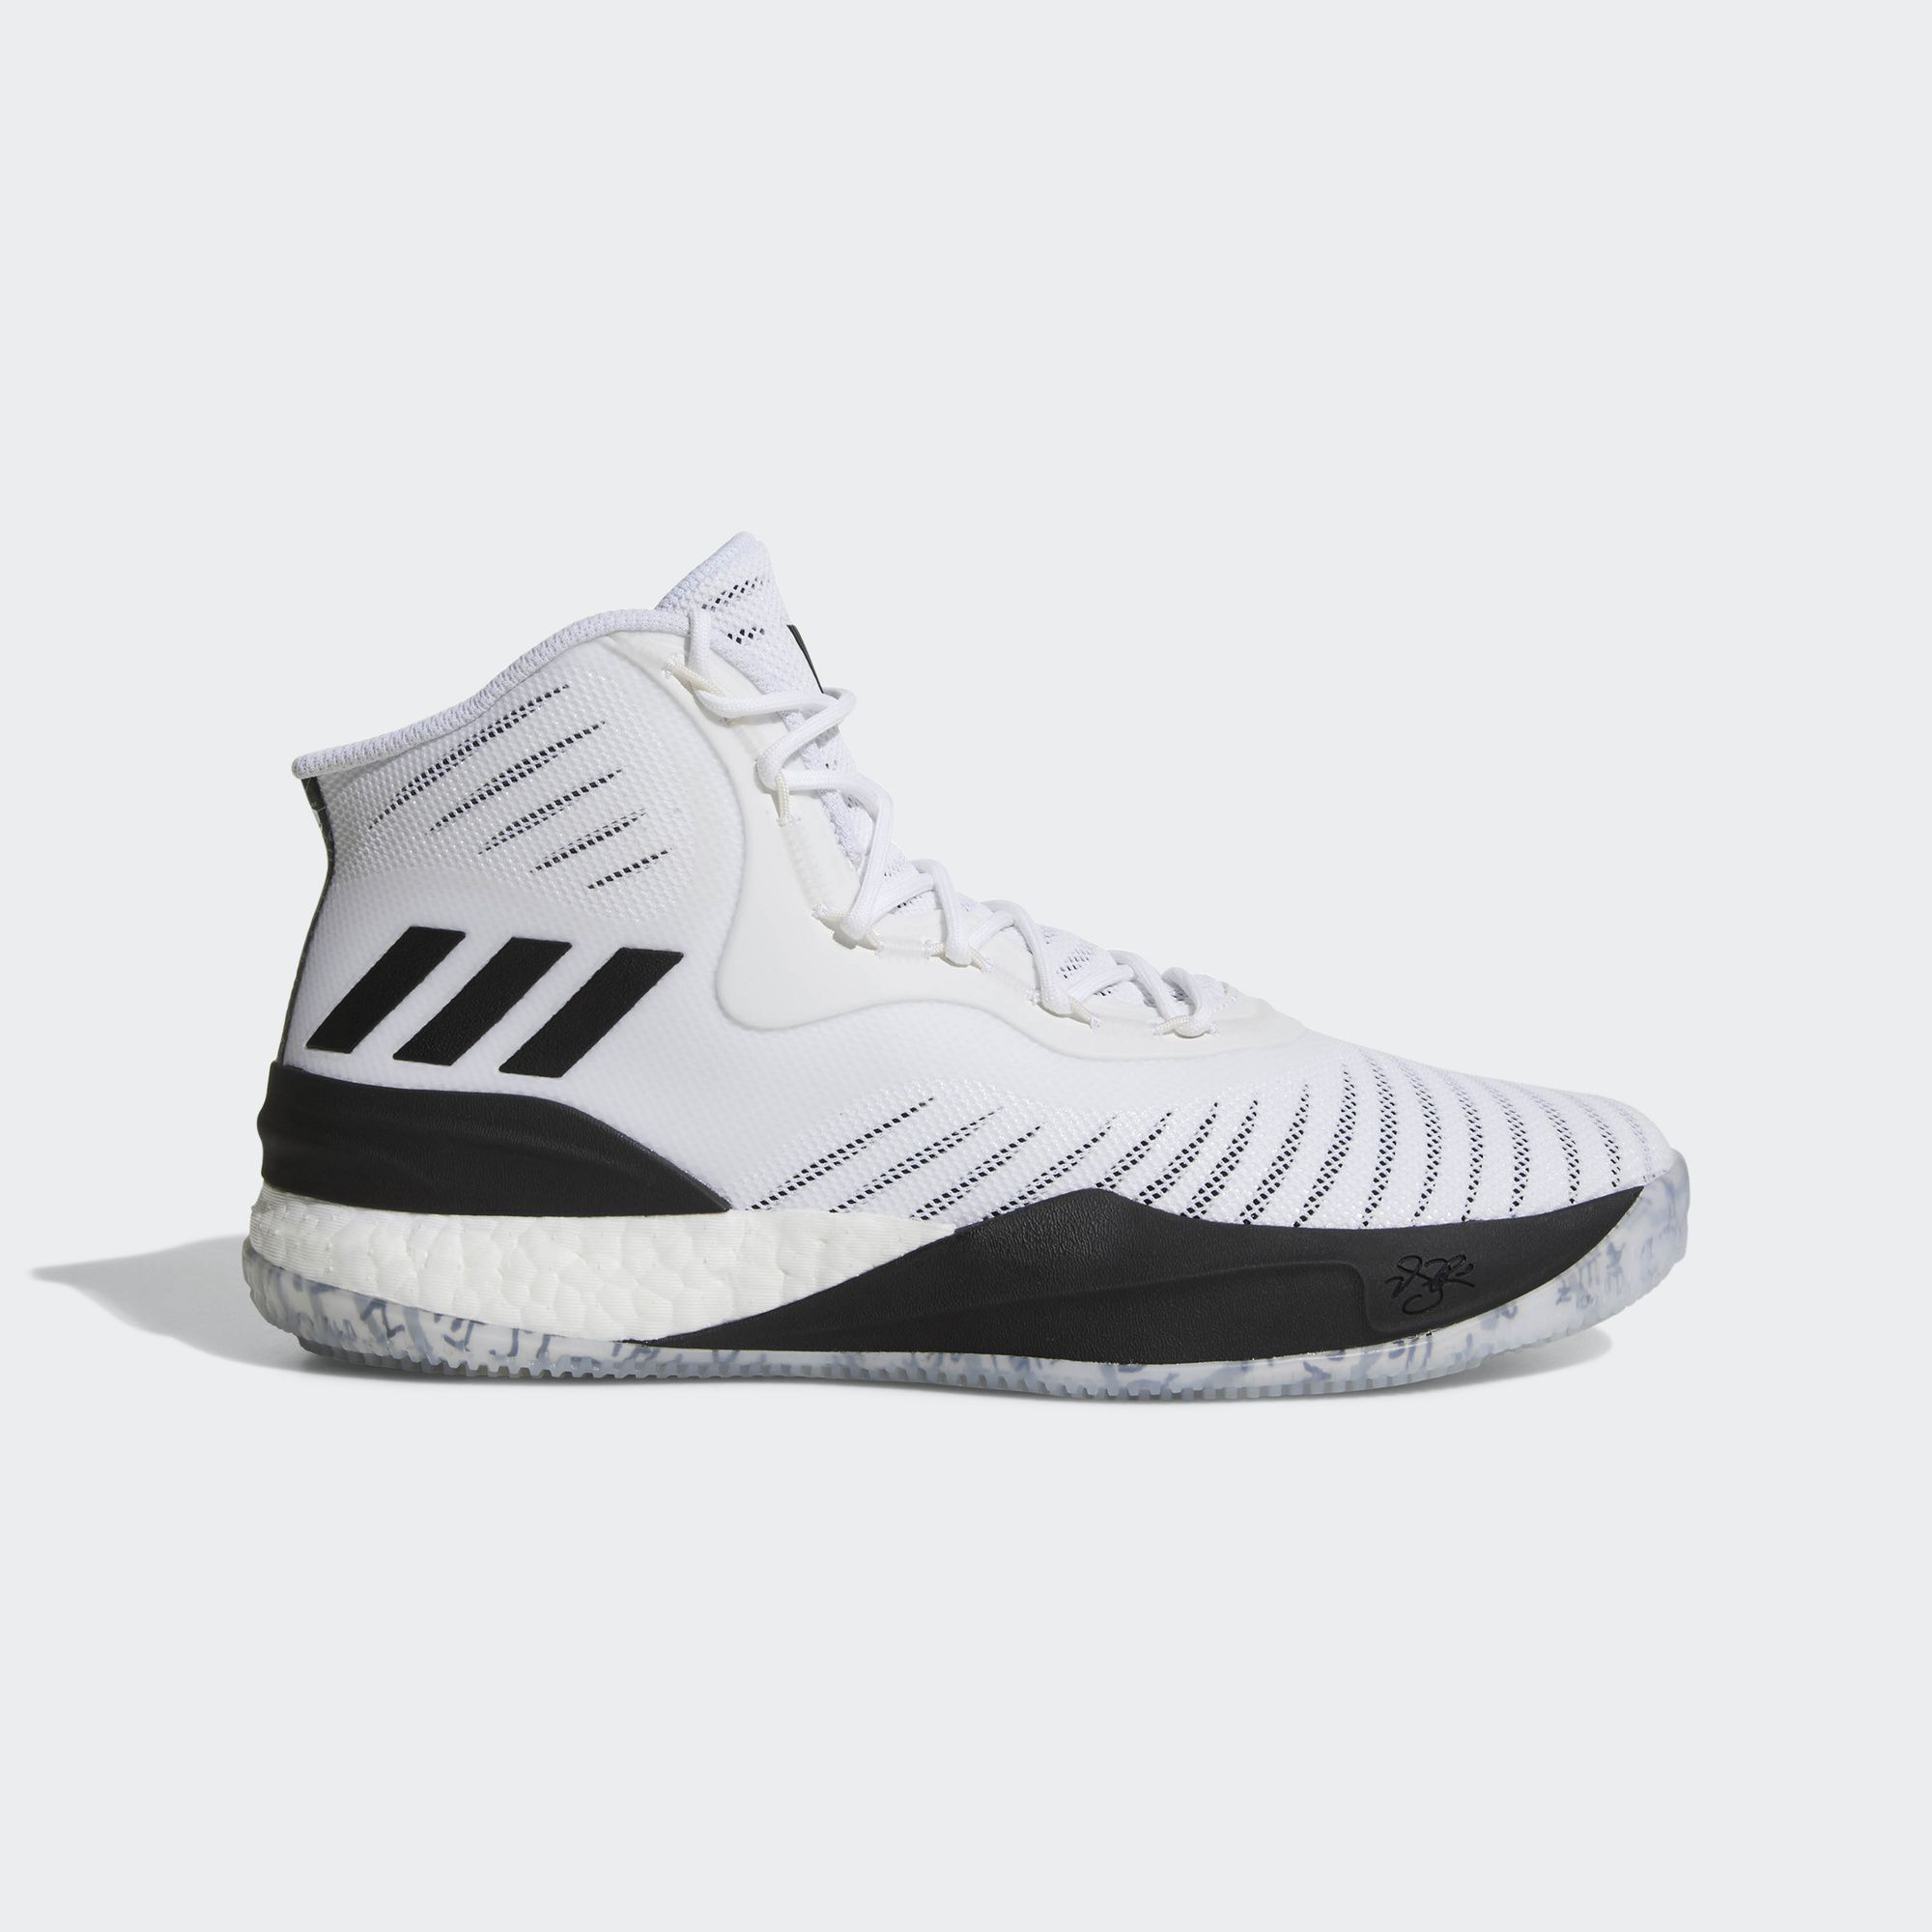 super popular b9313 fdd55 ... coupon code for adidas rose 8 black white 1 c4c2a 8a895